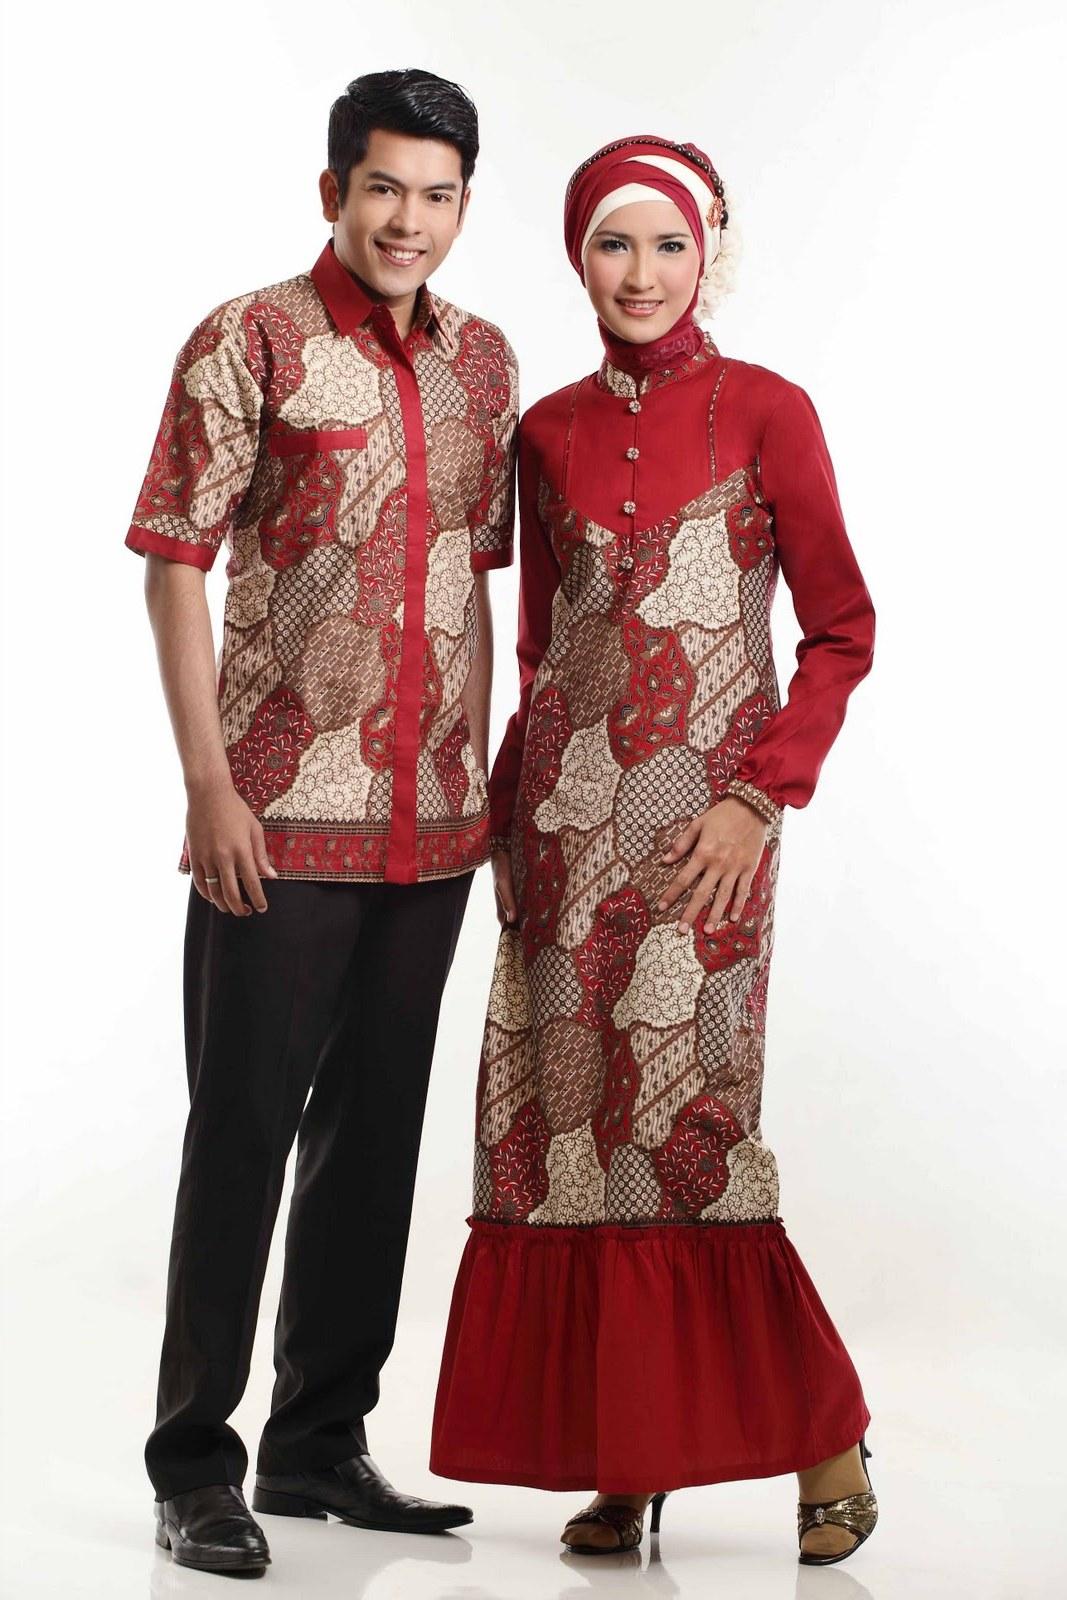 Design Gambar Baju Lebaran Gdd0 Bintang anda Trend Model Baju Batik Lebaran Terbaru 2013